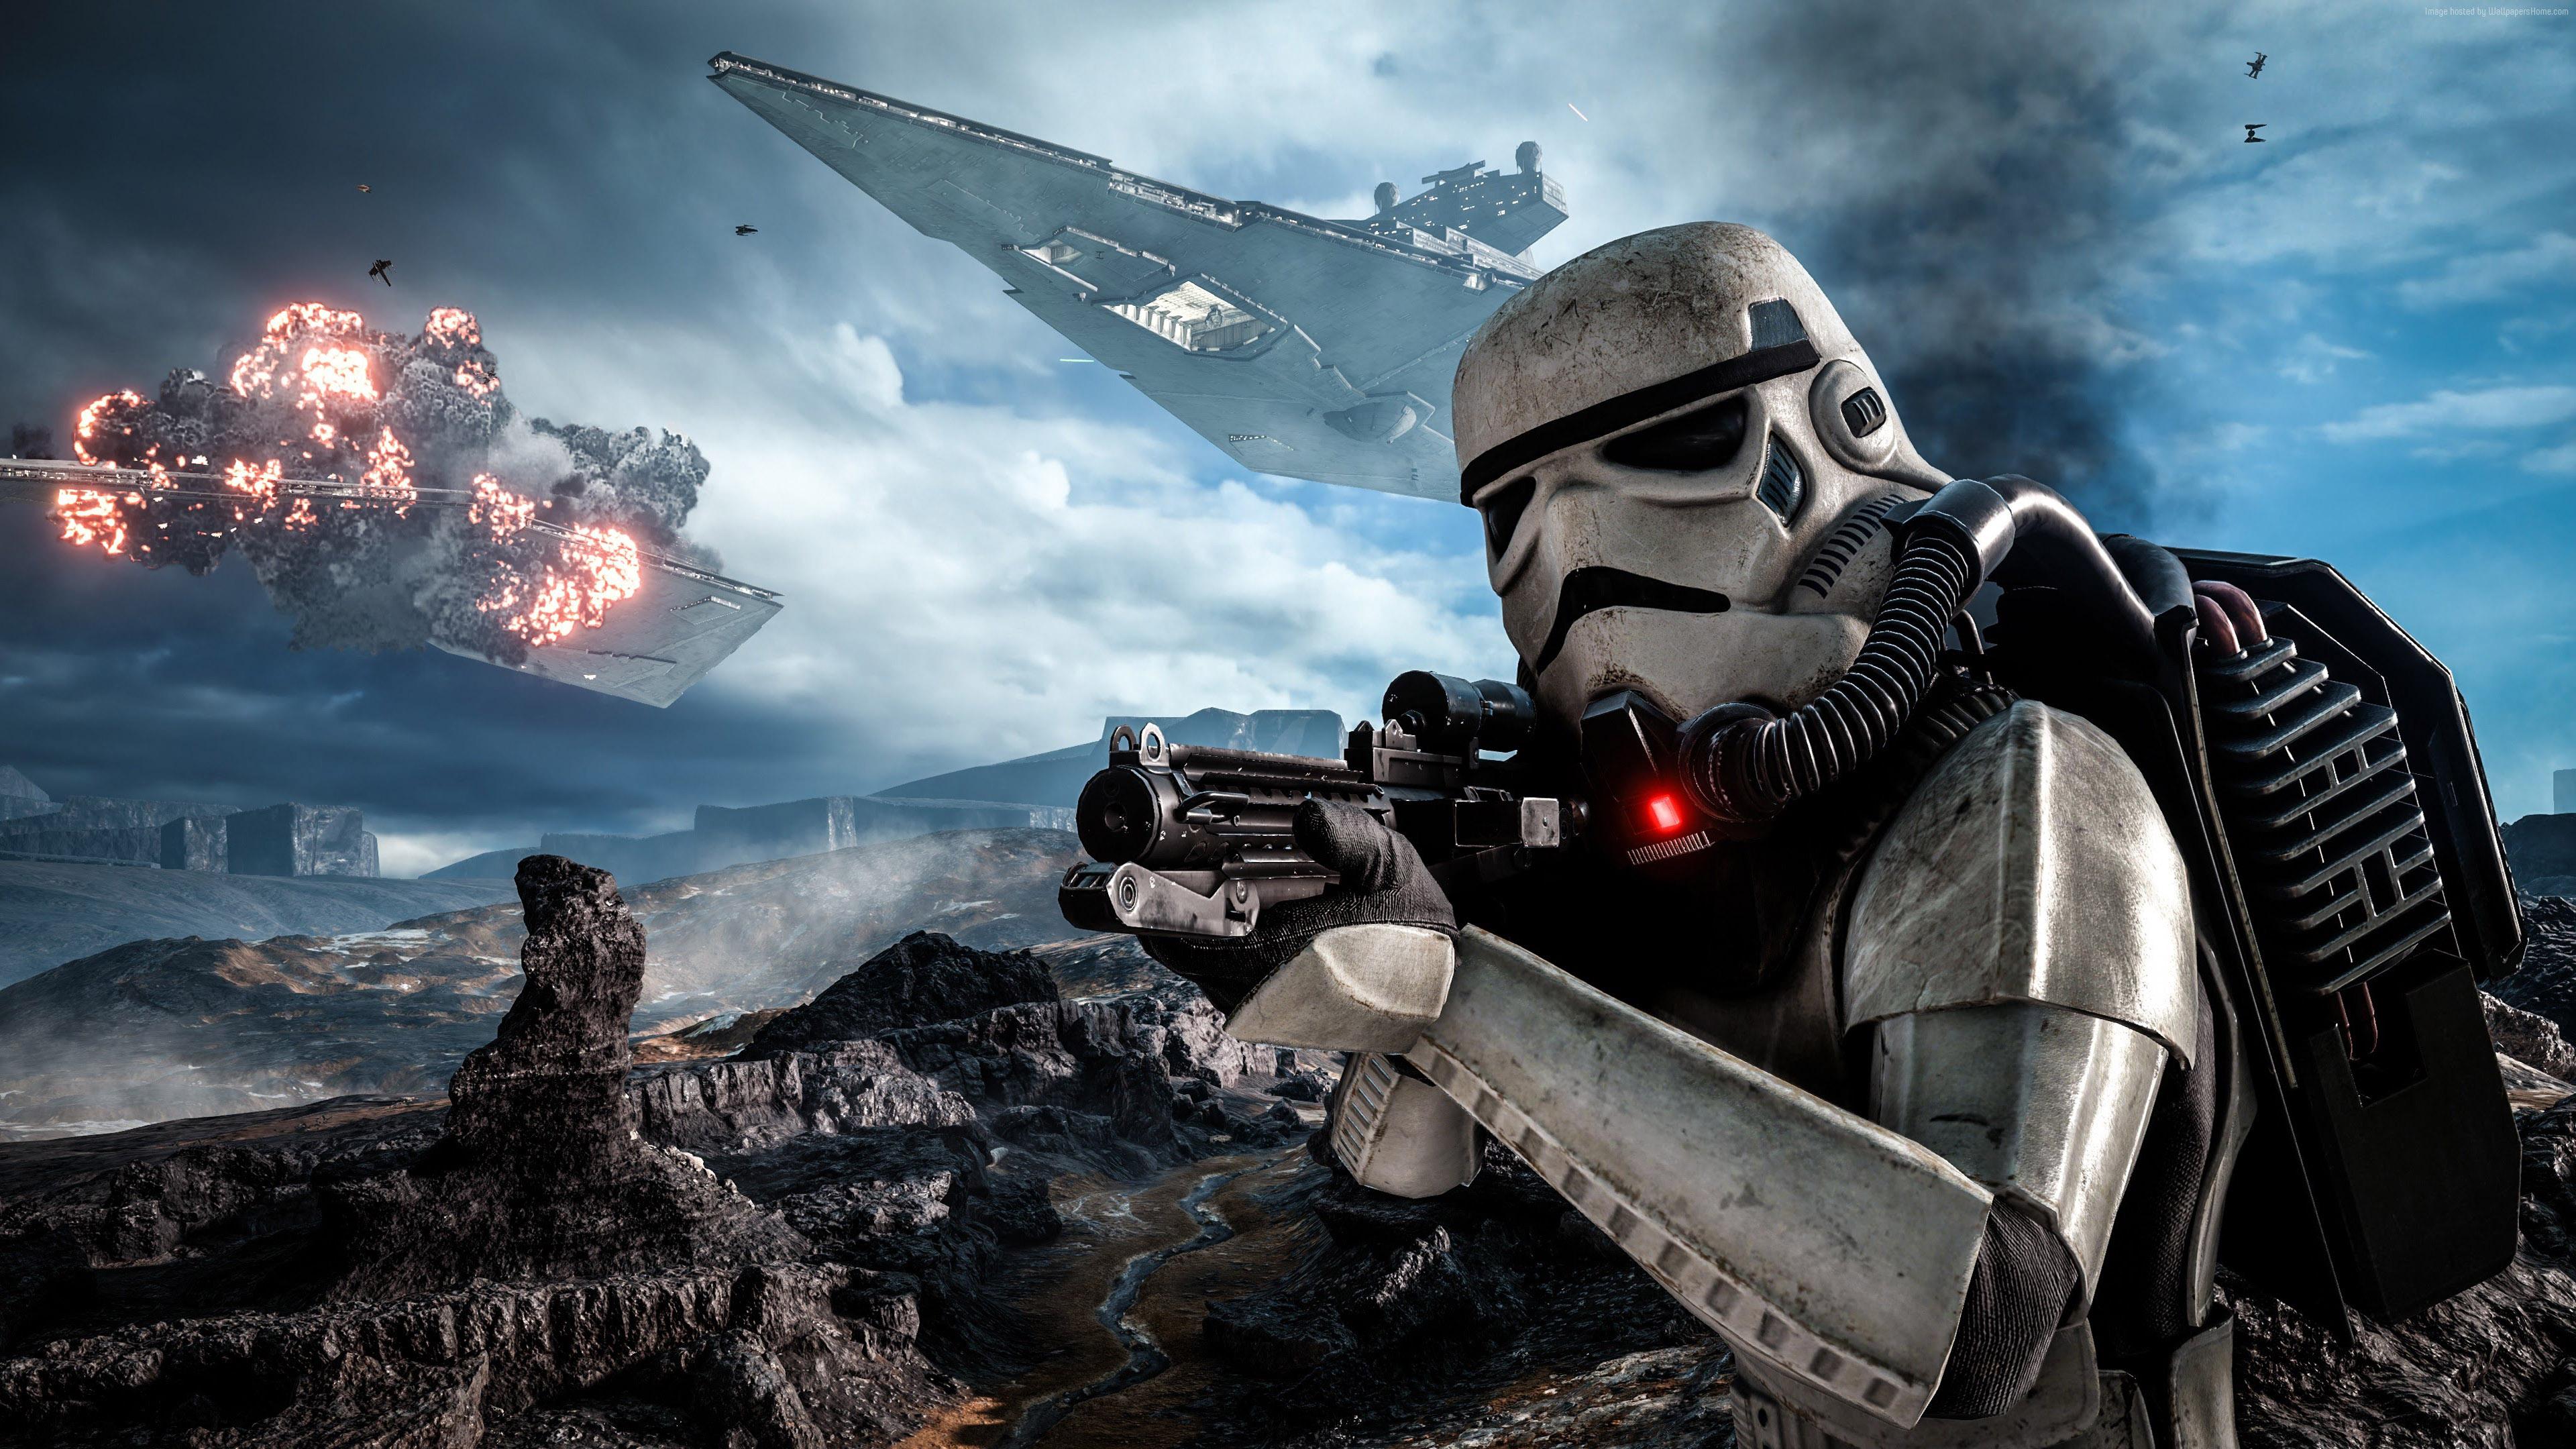 Darth Vader Iphone Wallpaper Hd Star Wars Gameplay Battle Of Hoth Battlefront Stormtrooper